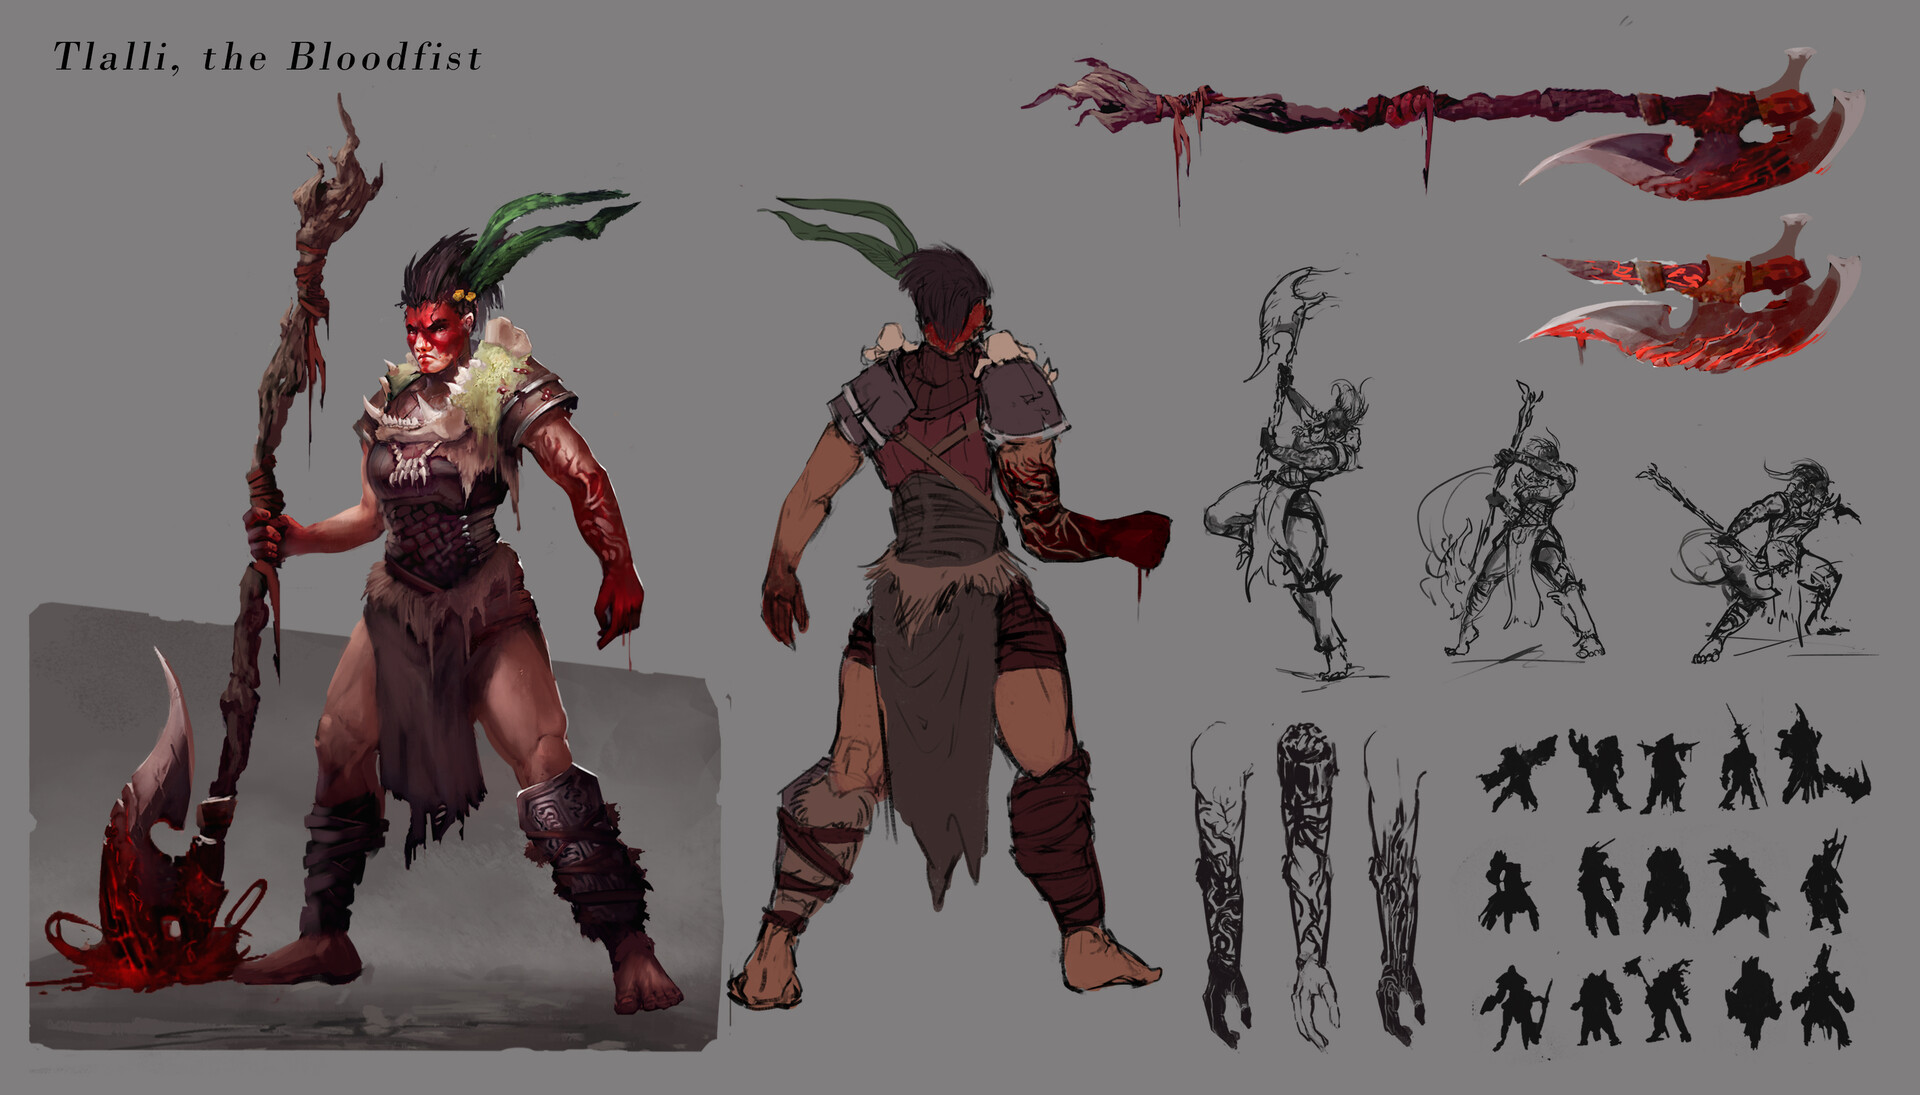 Tlalli, the Bloodfist